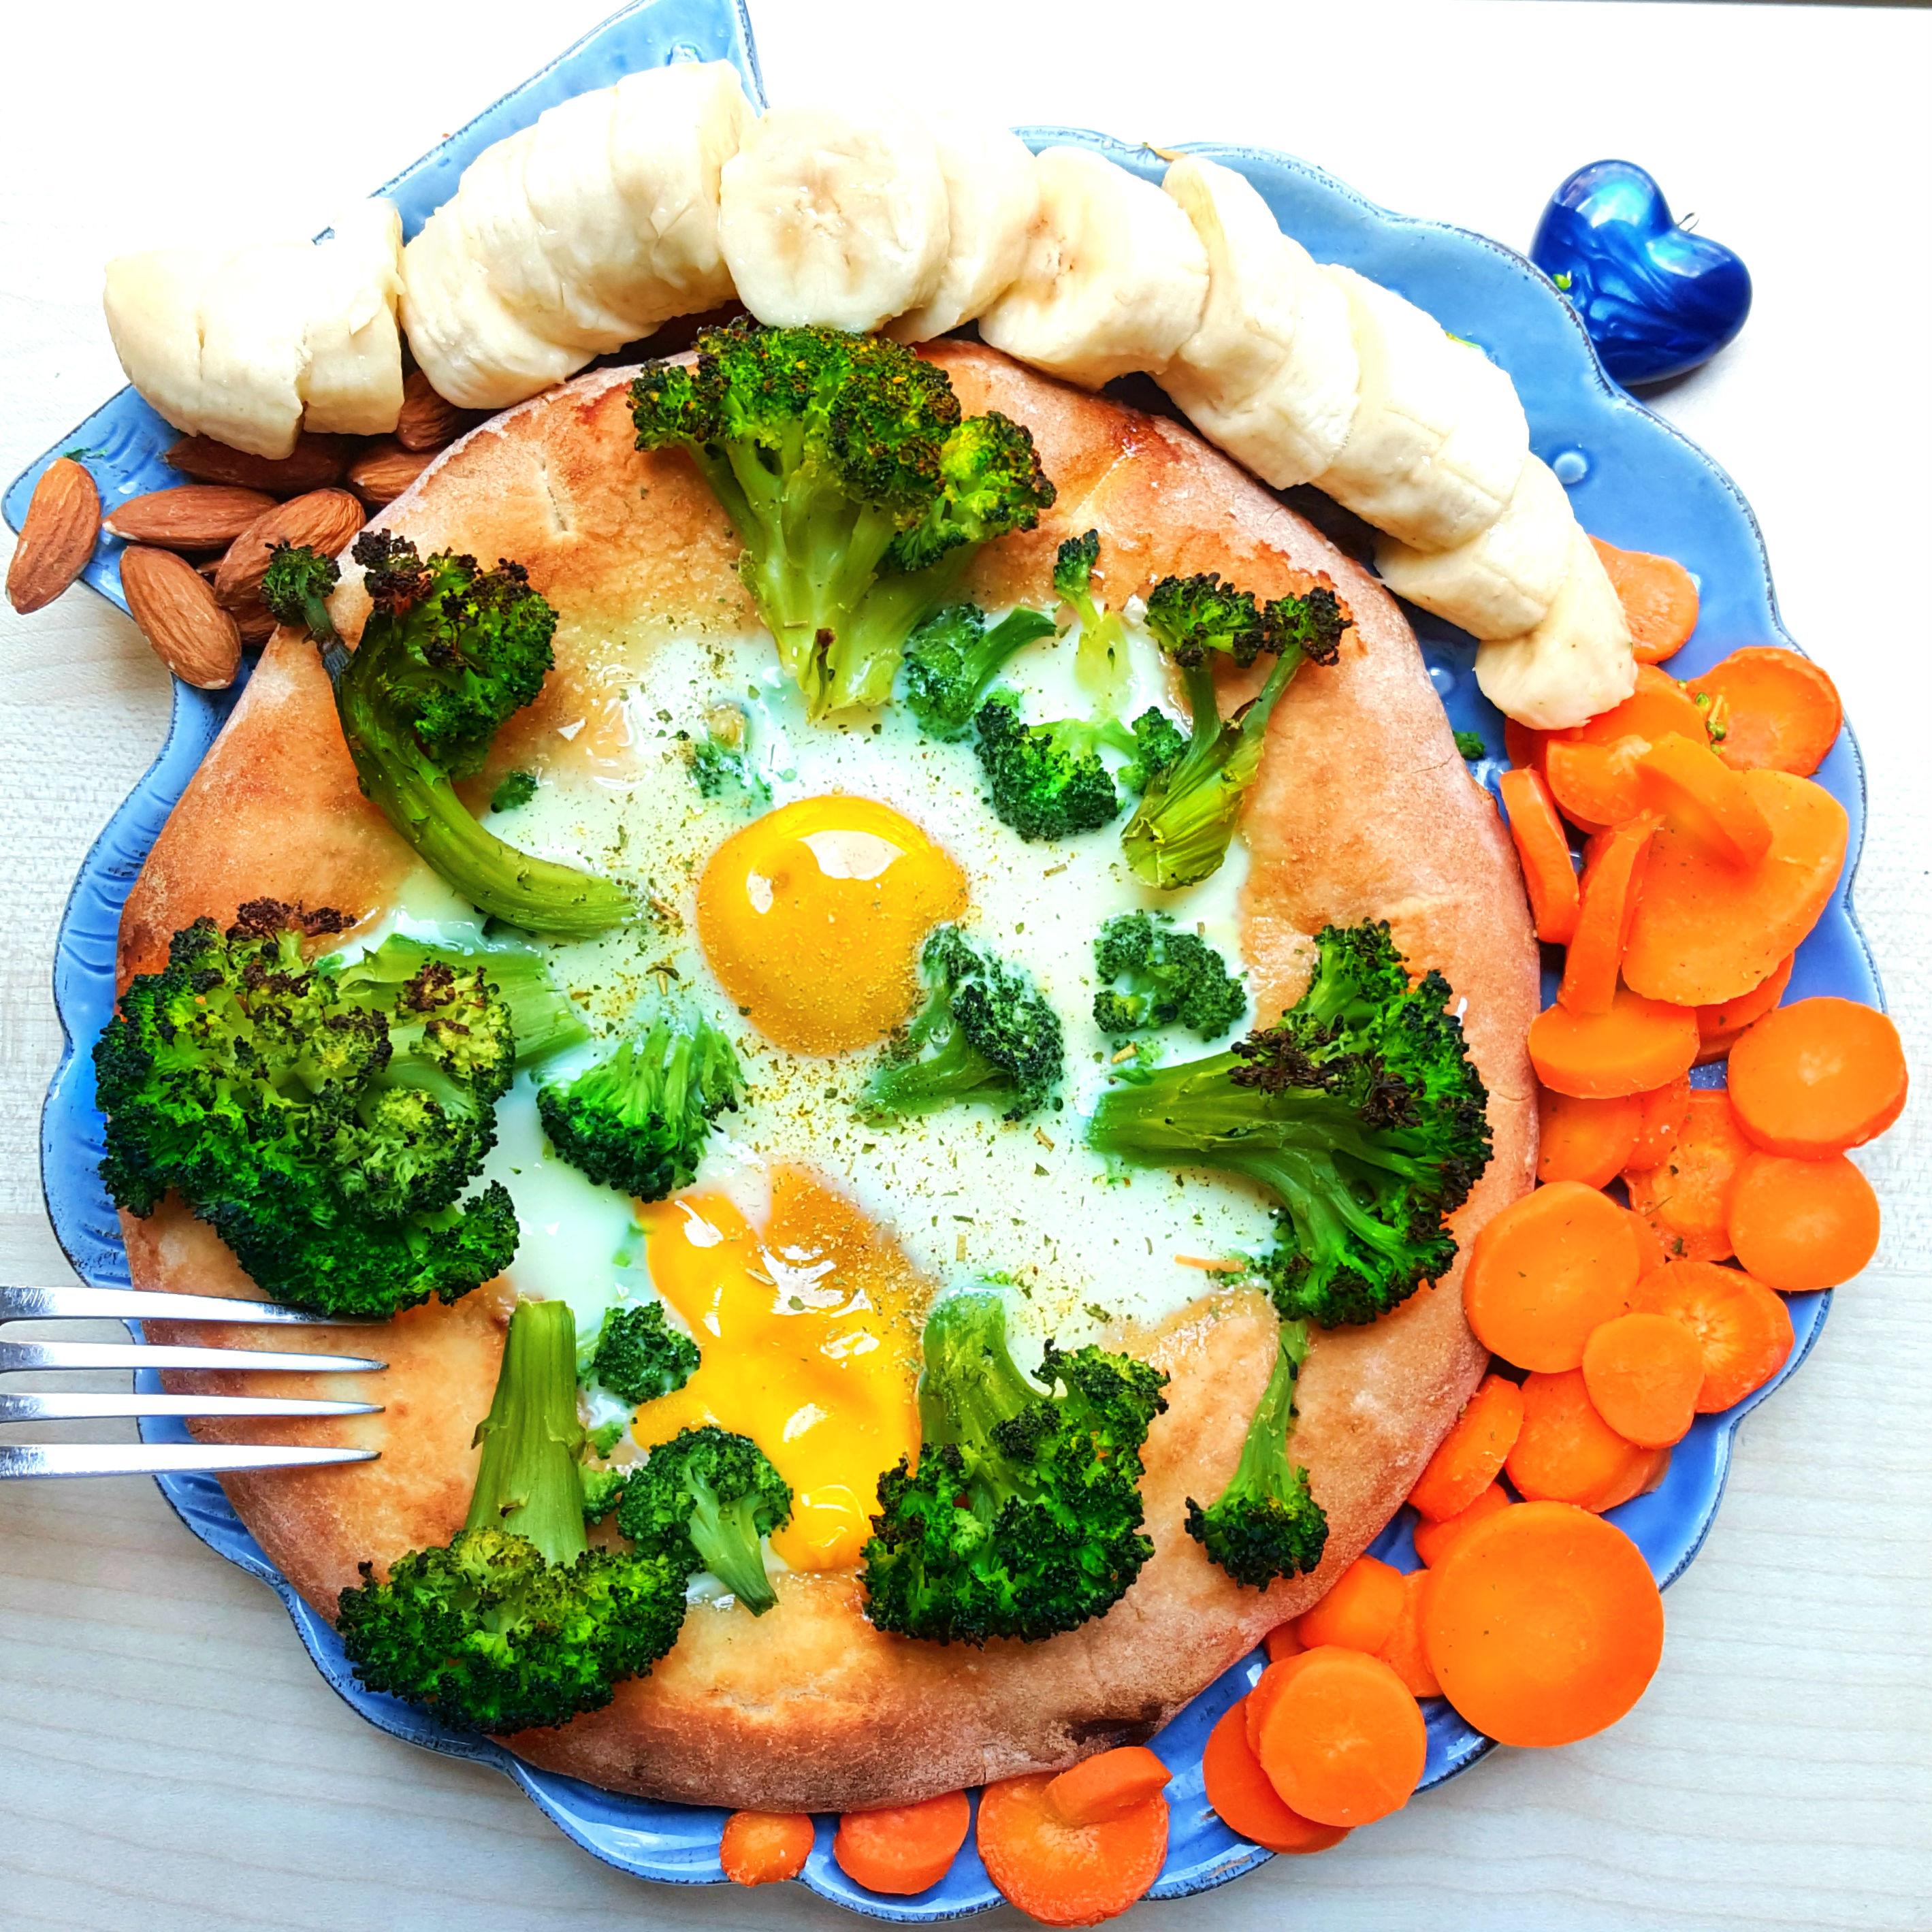 boomerang banana, gettoni carote, racchette broccoli, frisbee sole, tetris mandorle